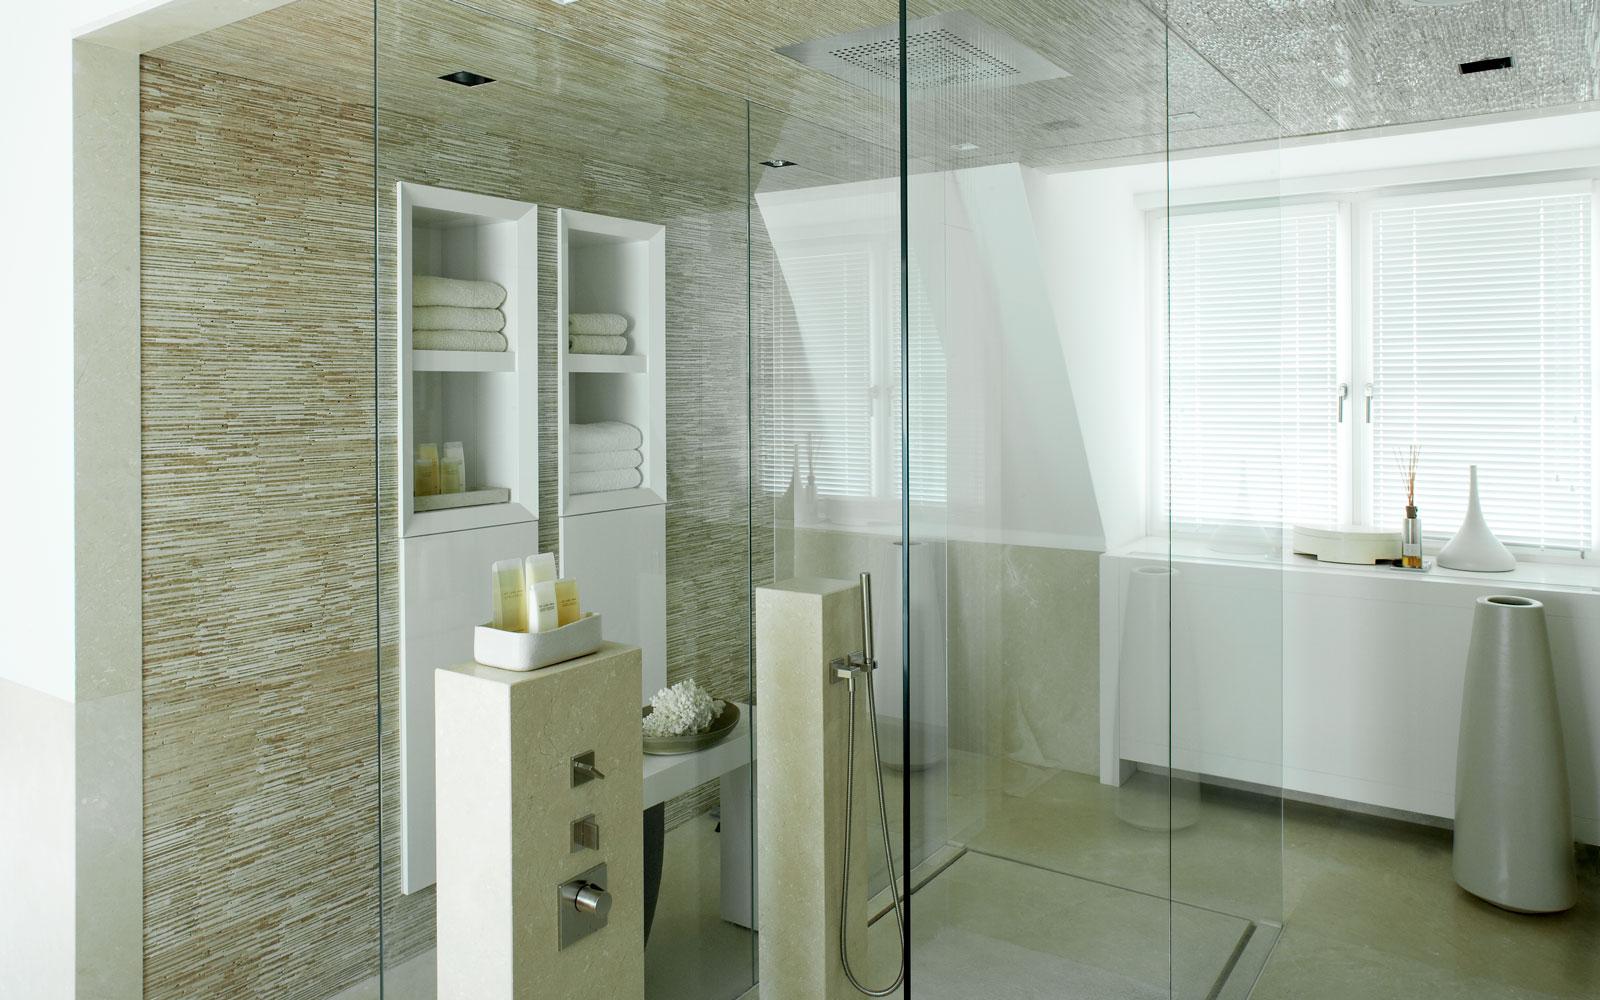 Sauna, wellness, ontspannen, souterrain, luxe, riante villa, Leeflang Architectuur